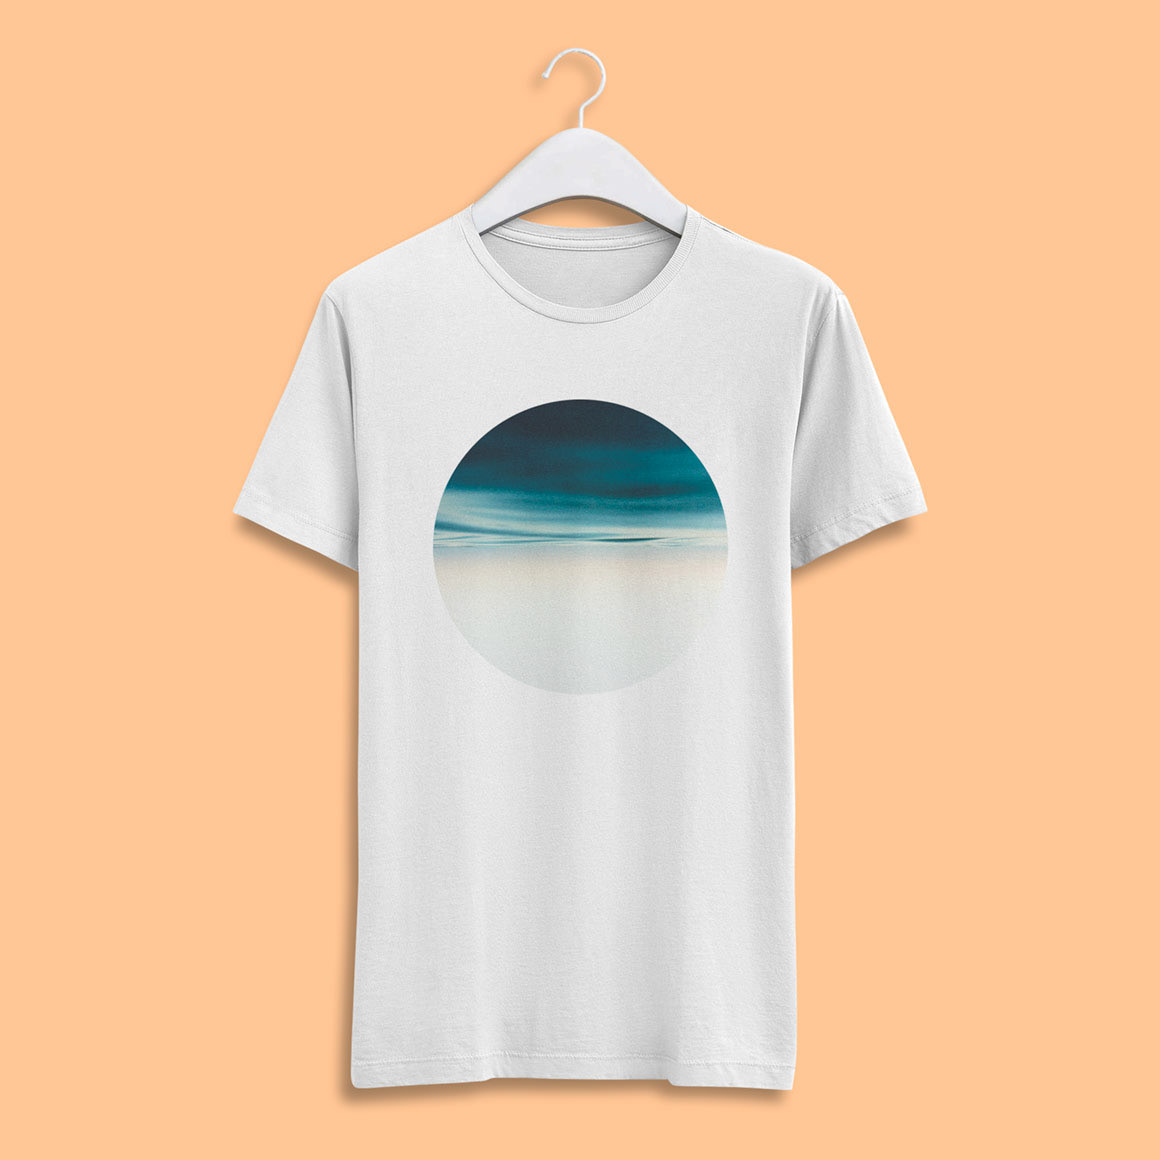 free Mockup psd t-shirt shirt